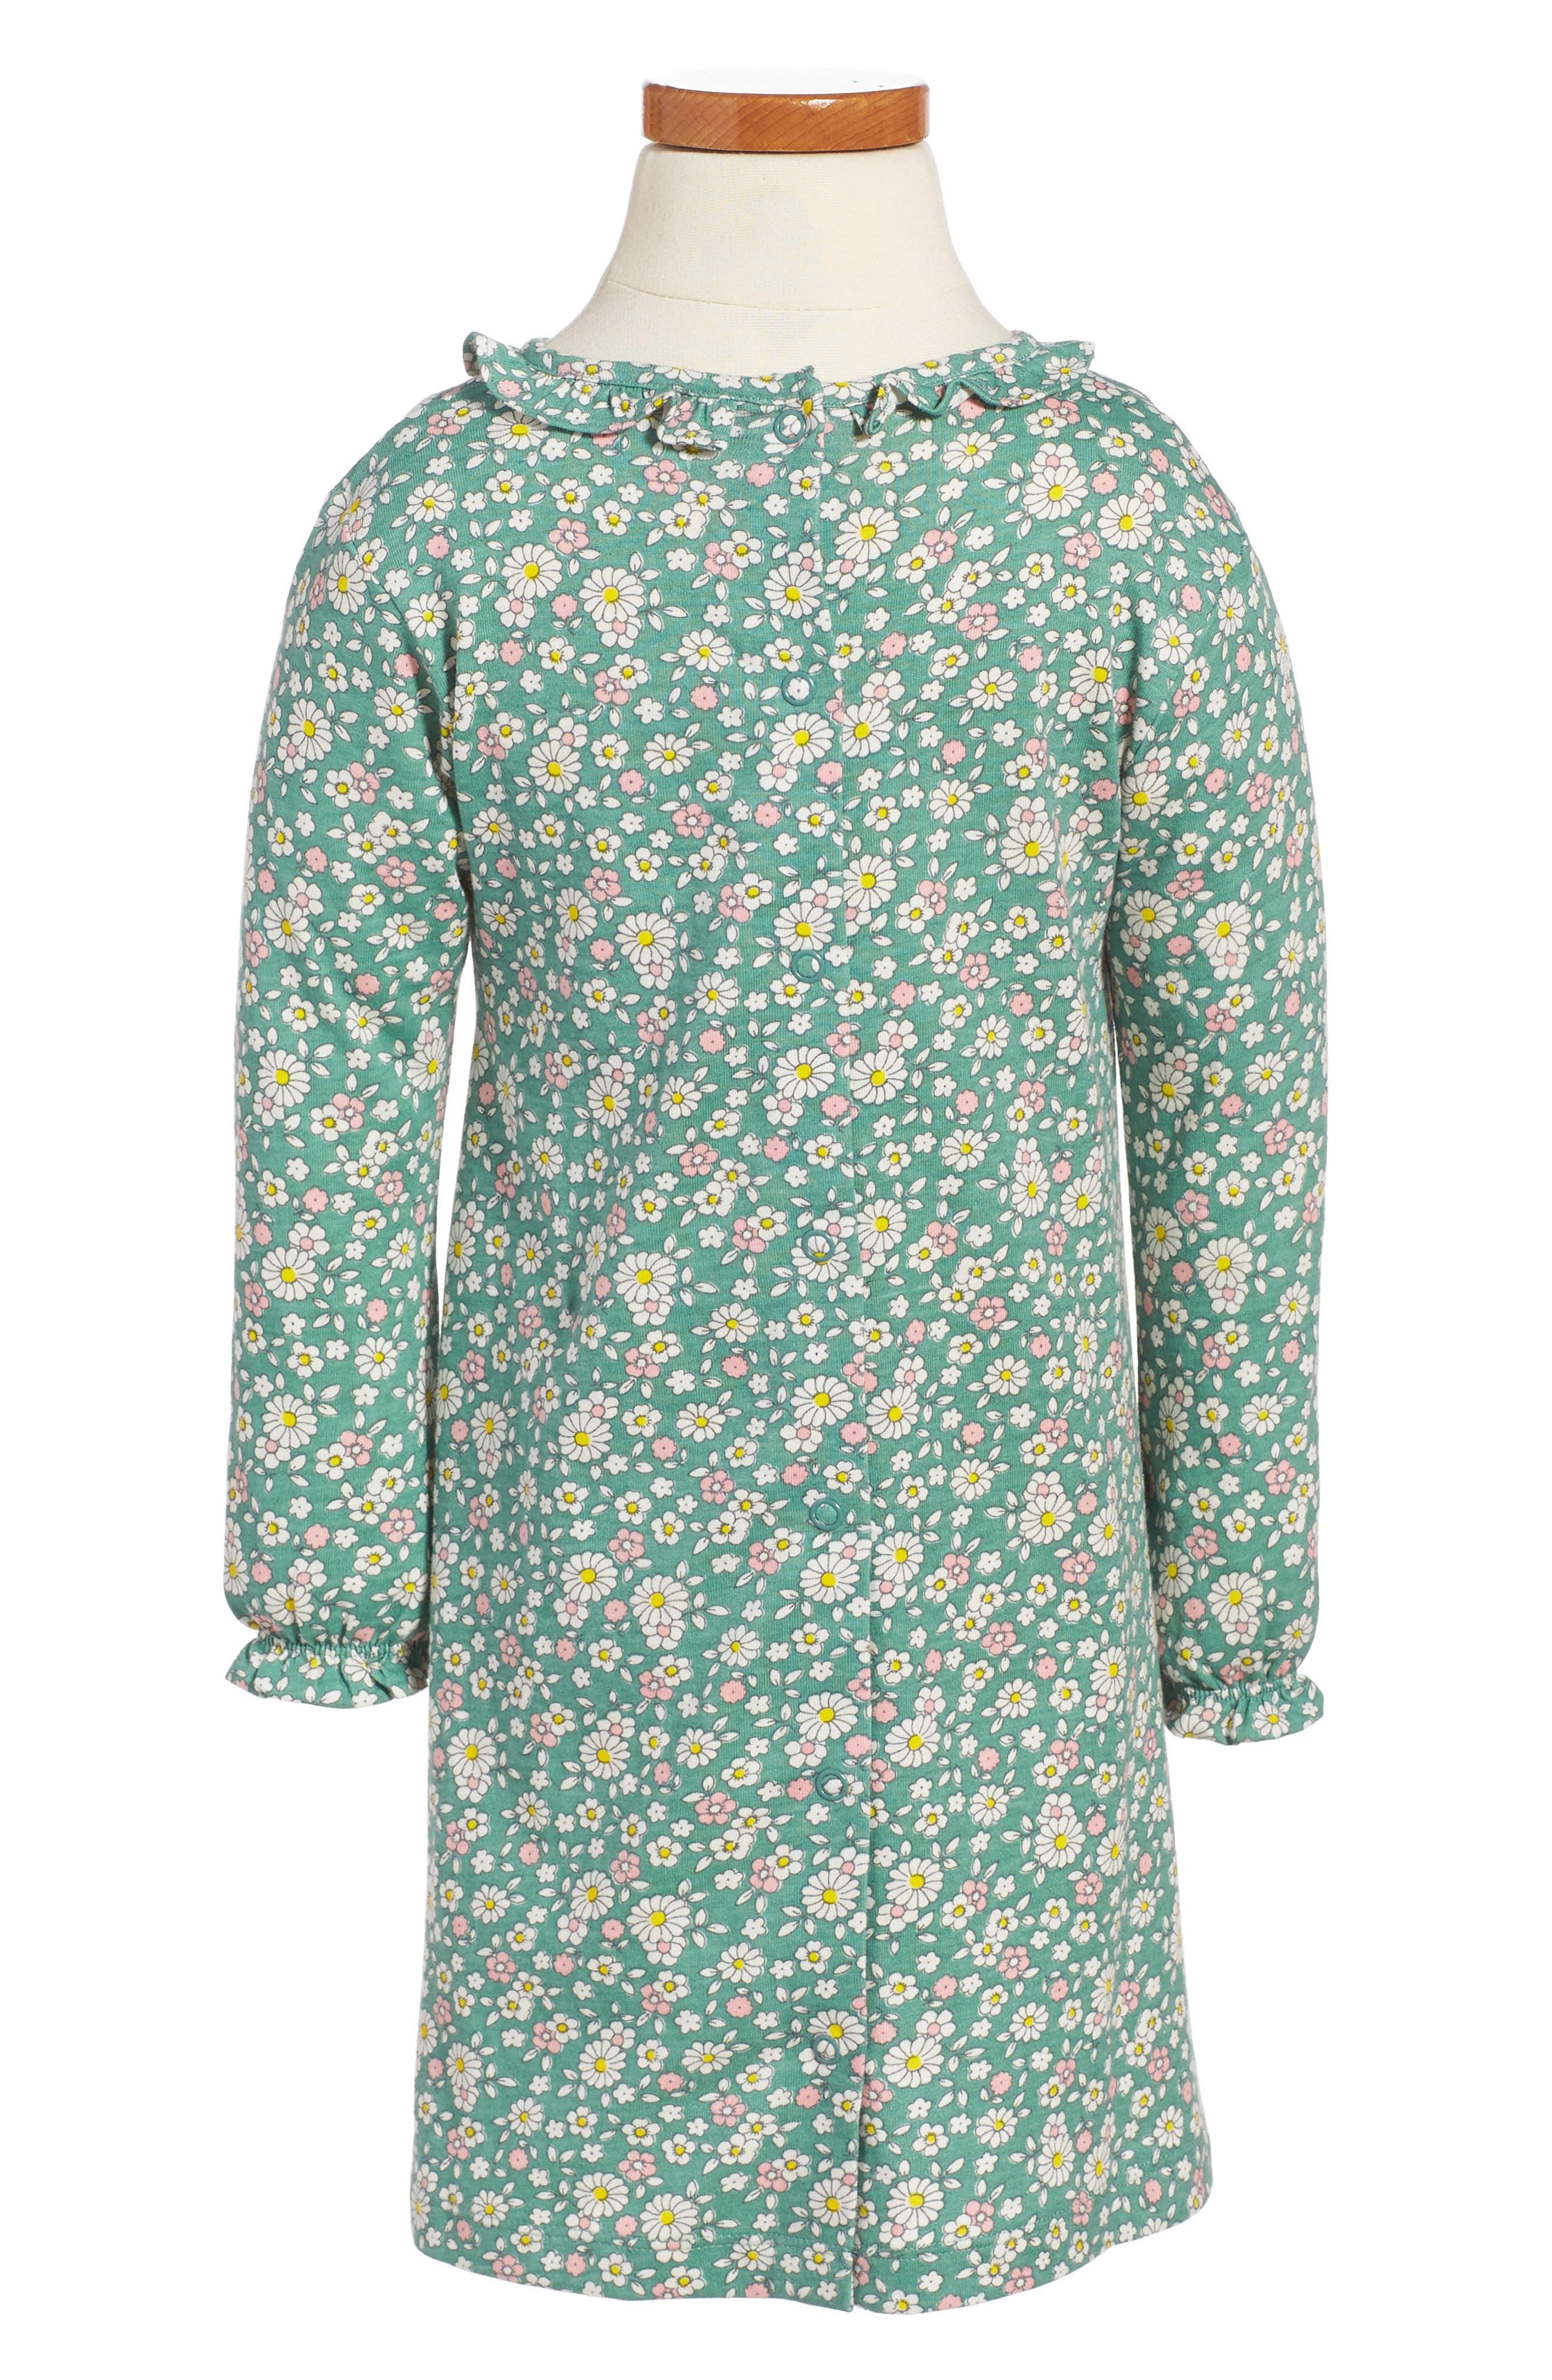 Pretty Print Jersey Dress,                             Alternate thumbnail 2, color,                             Green Vintage Daisy